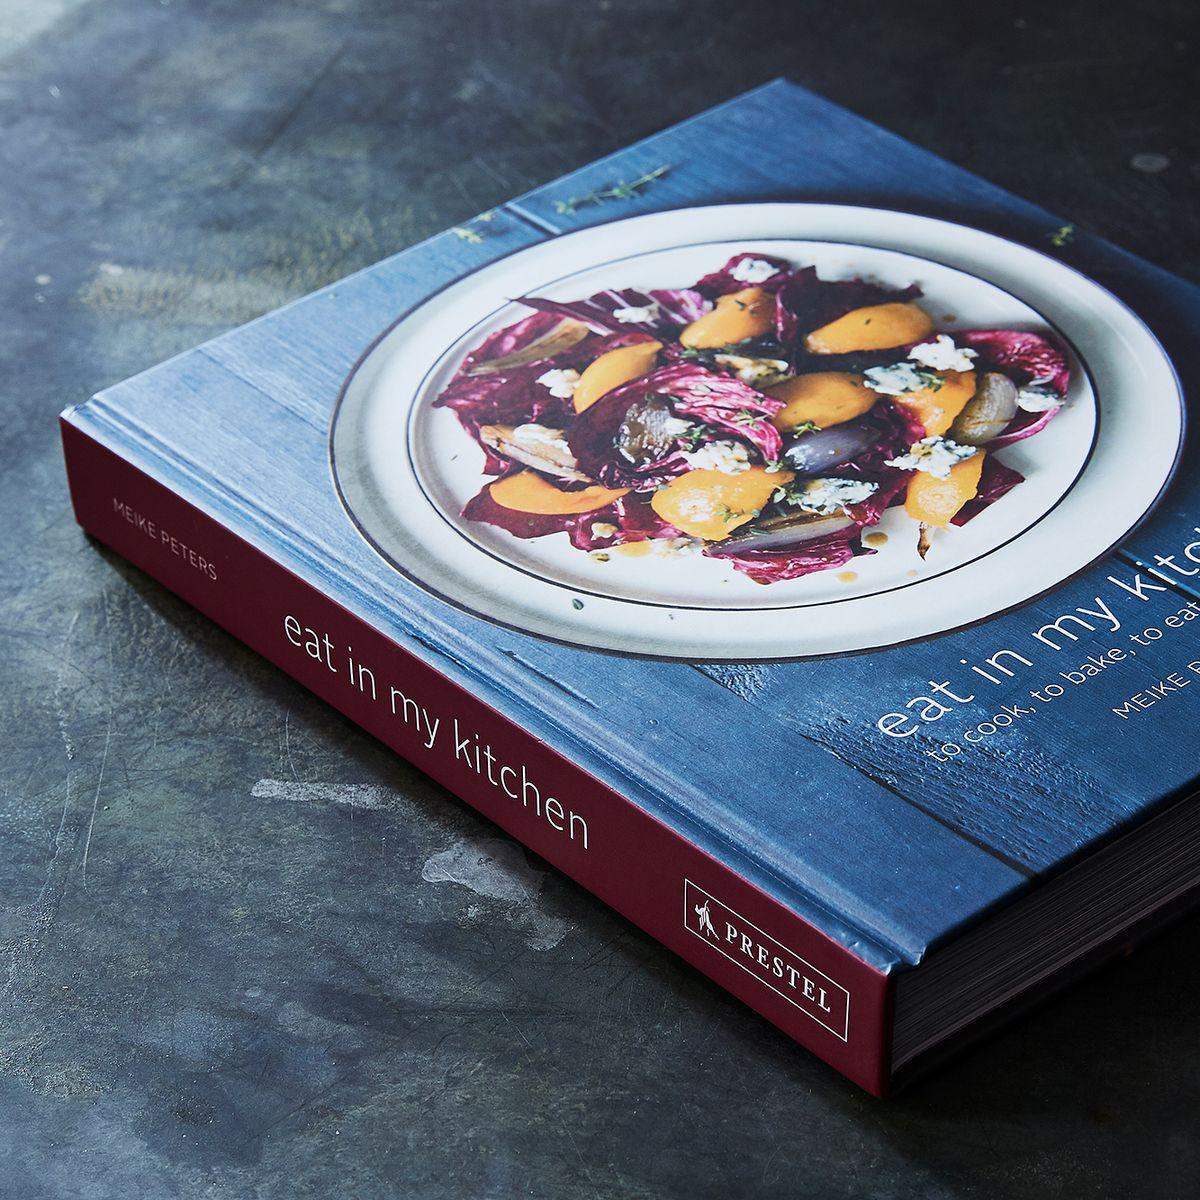 When German Comfort Food Meets Malta, a Beautiful Cookbook is Born